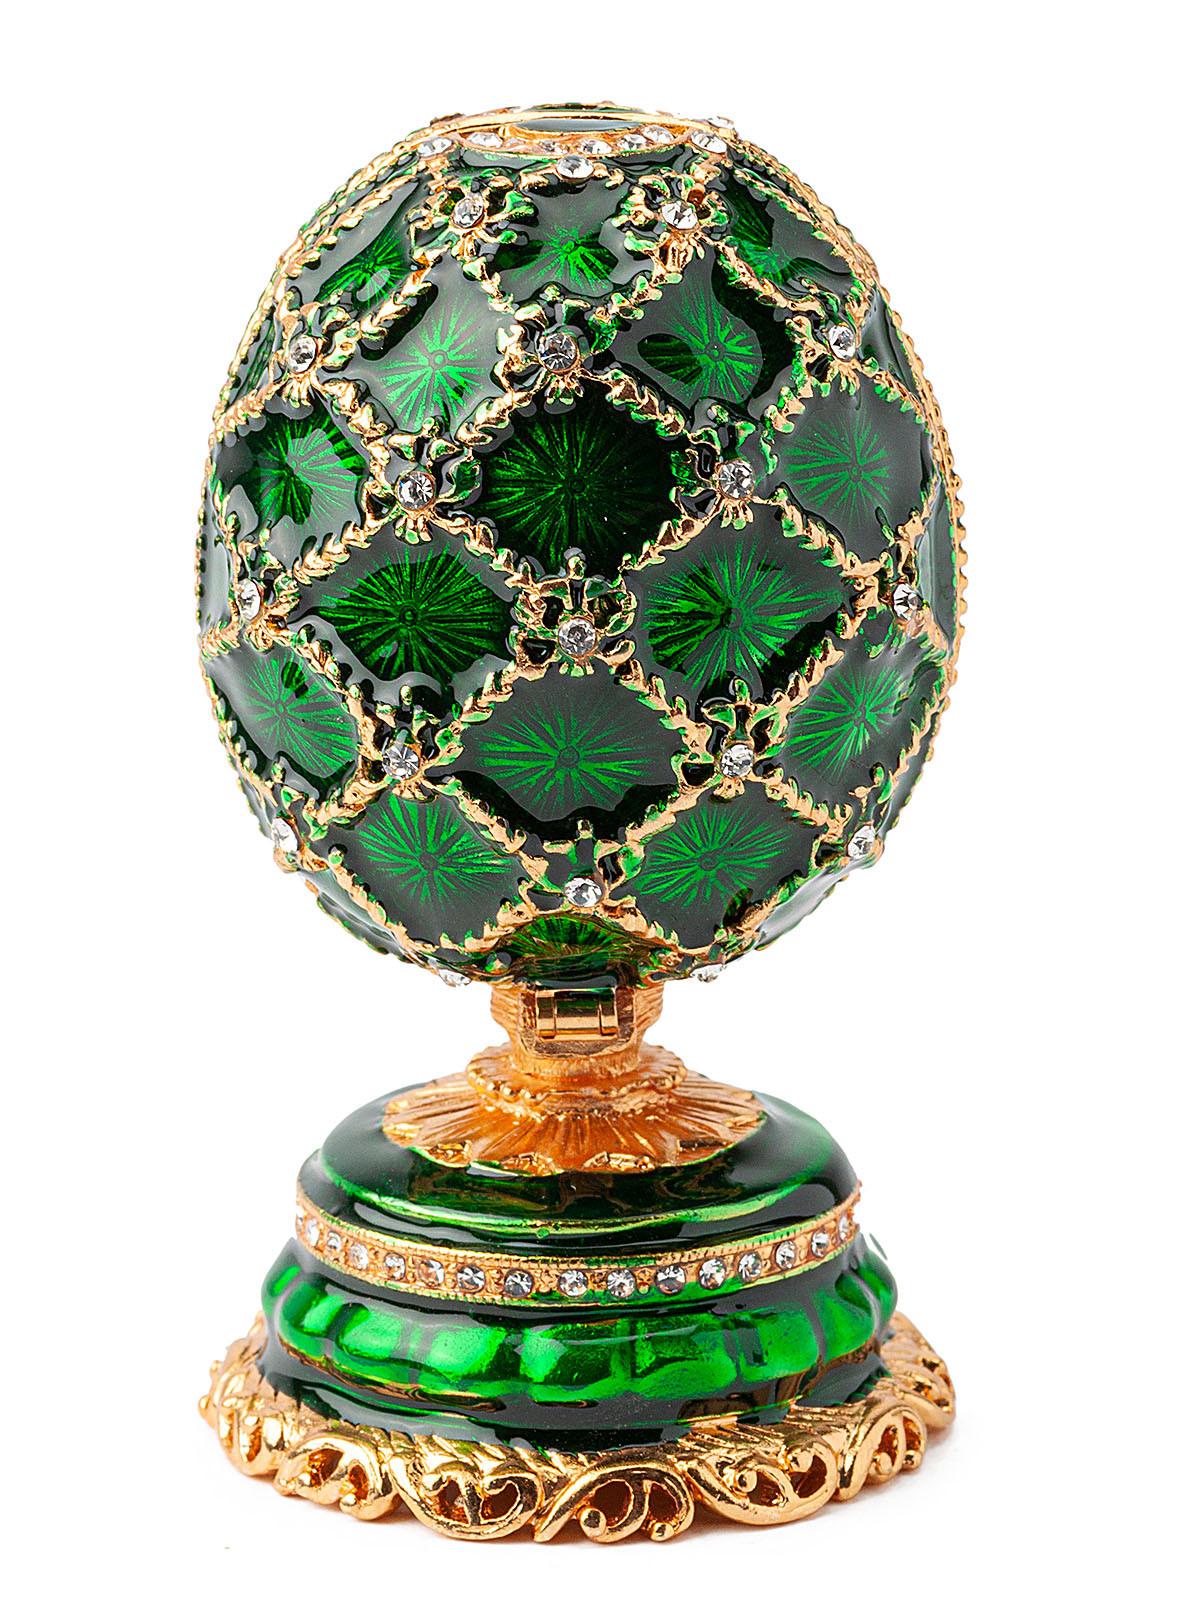 Шкатулка для украшений Яйцо Фаберже S-4990B зеленый